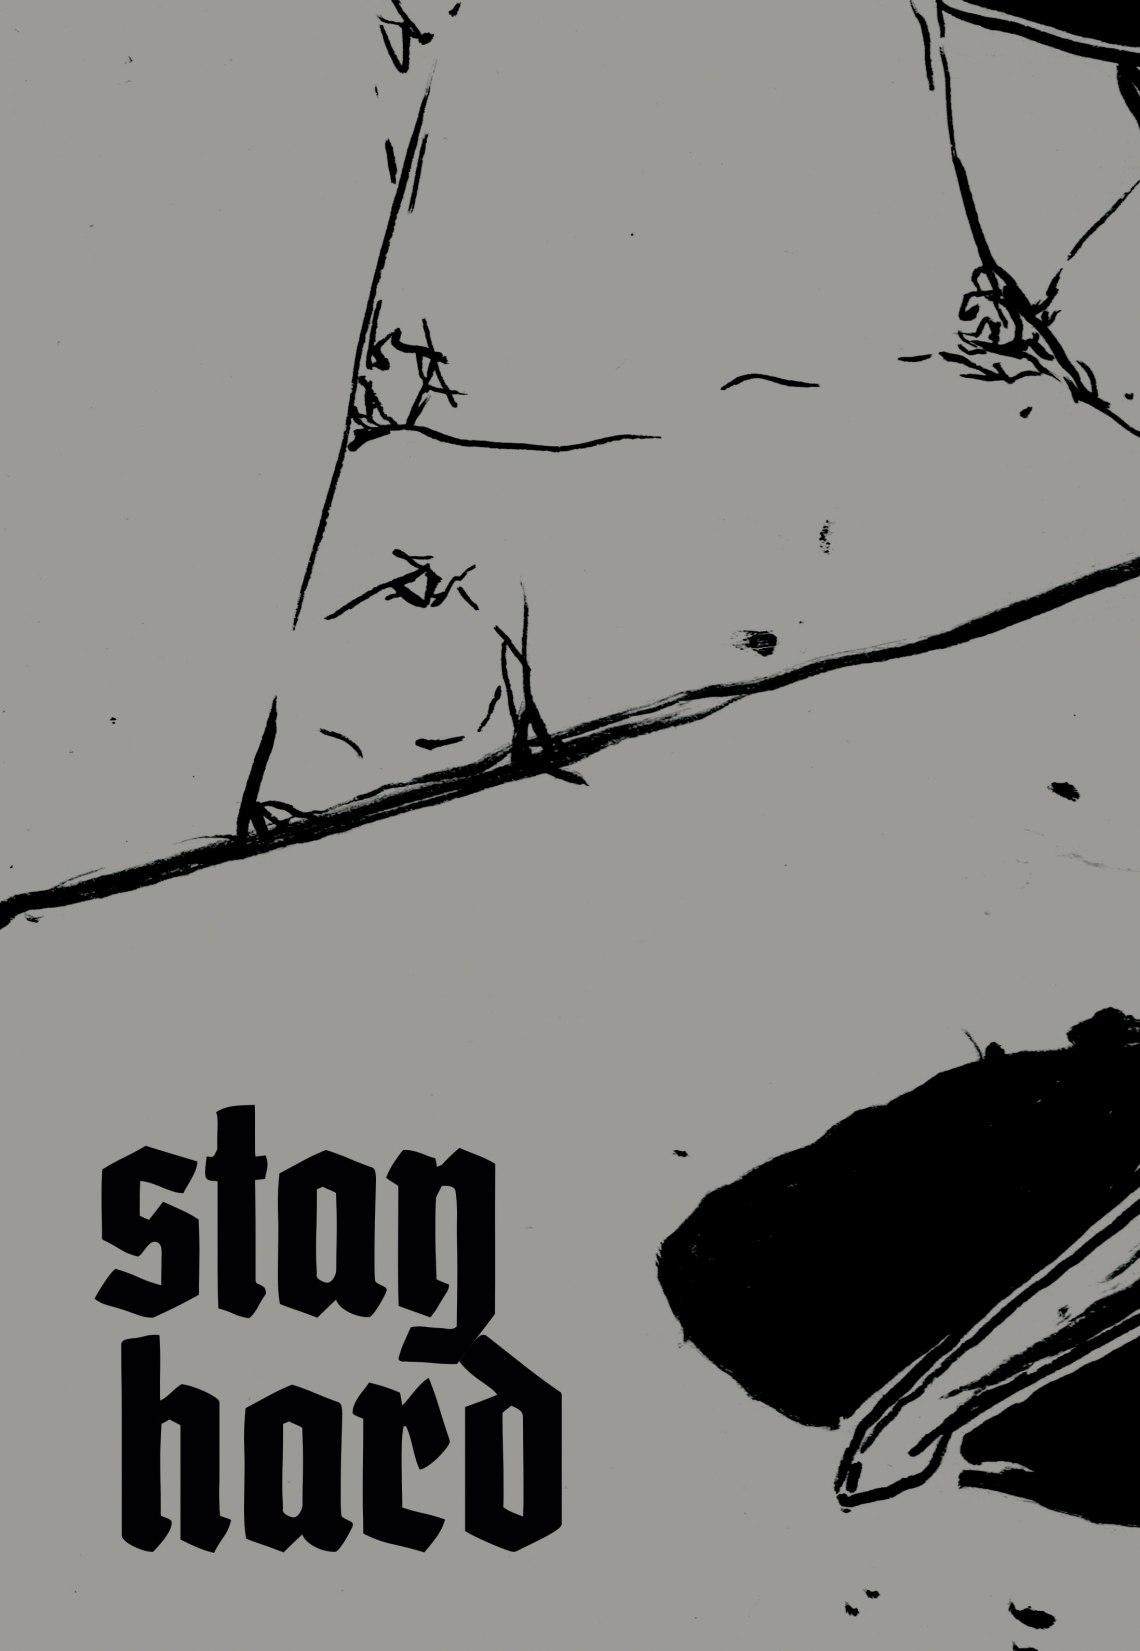 StayHard99